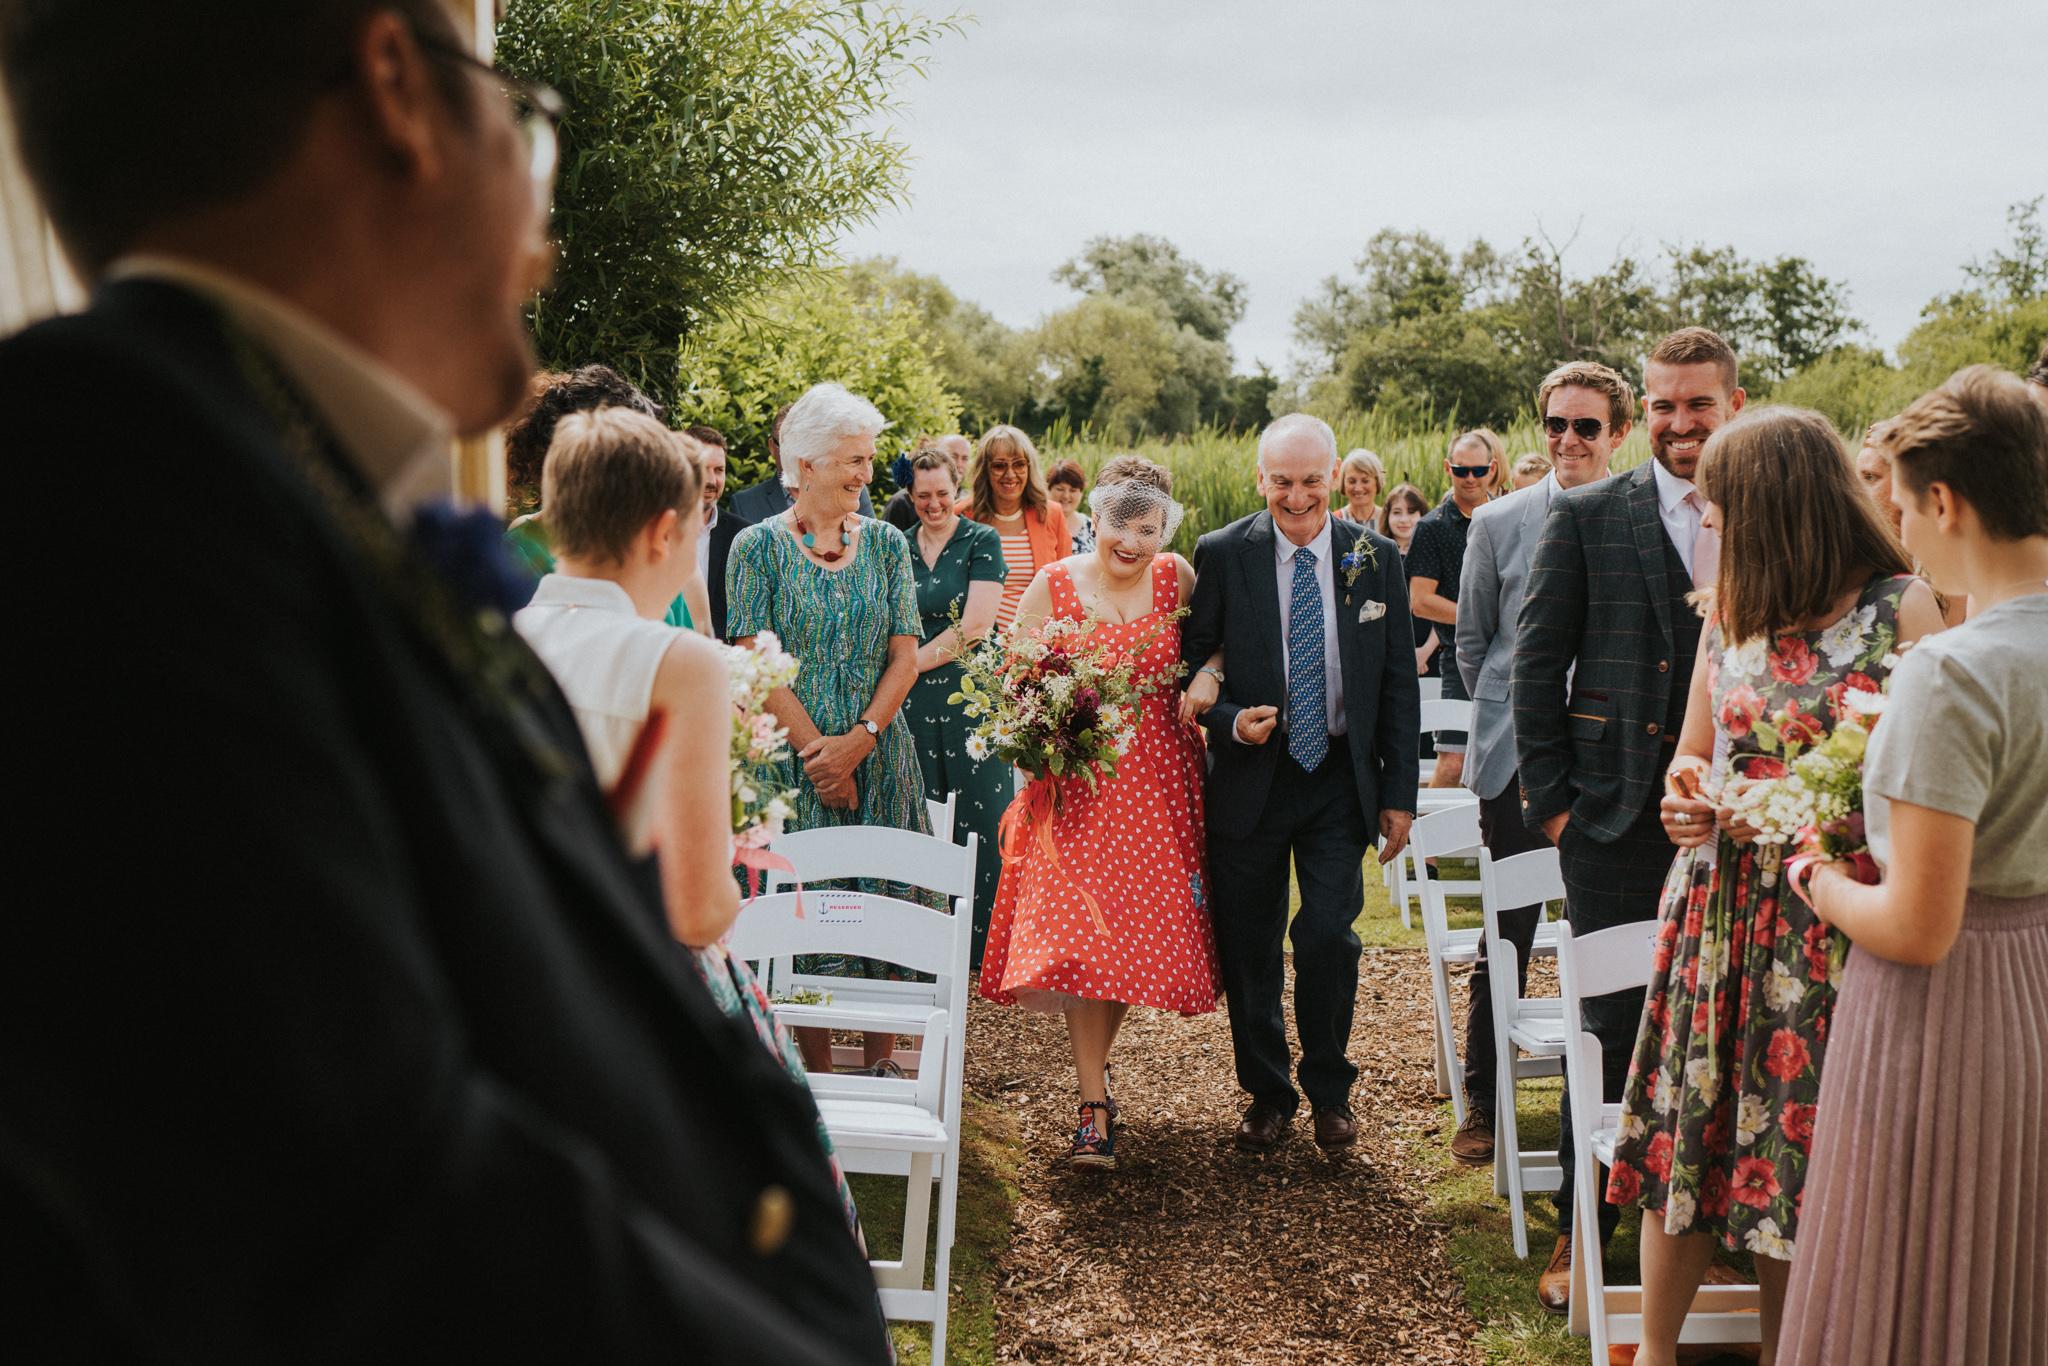 hannah-anthony-thorpeness-retro-diy-50s-wedding-grace-elizabeth-colchester-essex-alternative-wedding-lifestyle-photographer-essex-suffolk-norfolk-devon (9 of 39).jpg